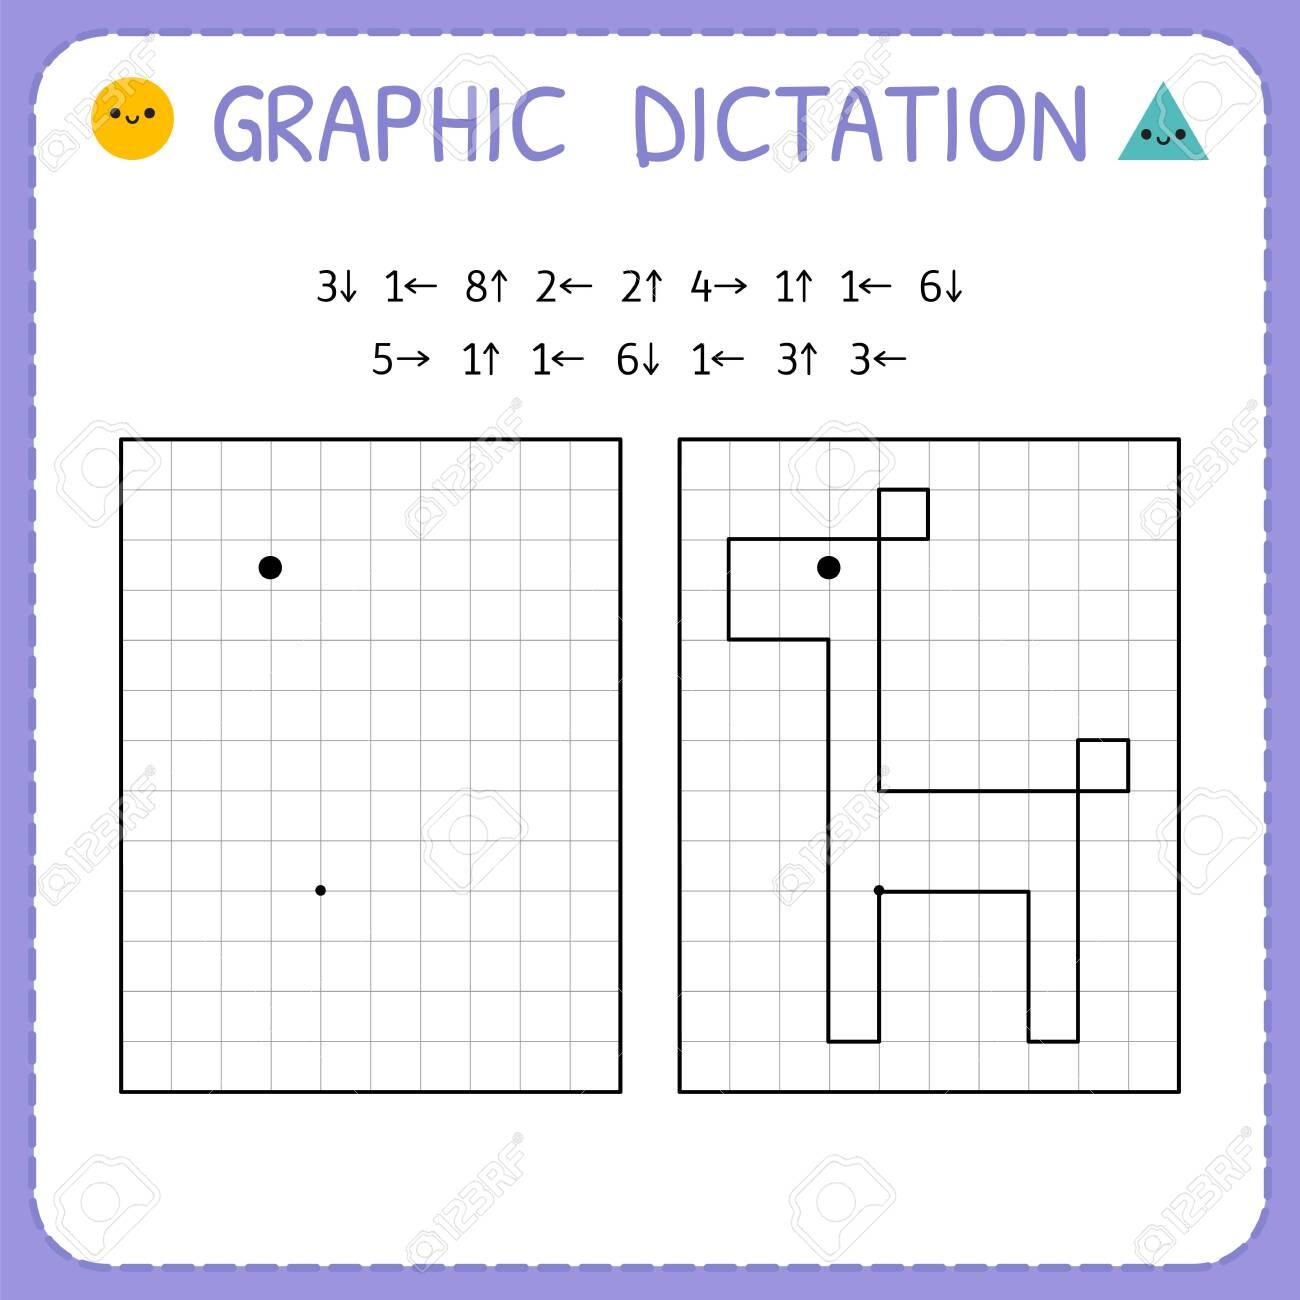 Graphic dictation. Giraffe. Kindergarten educational game for kids. Preschool worksheet for practicing motor skills. Working pages for children. Vector illustration - 123465007